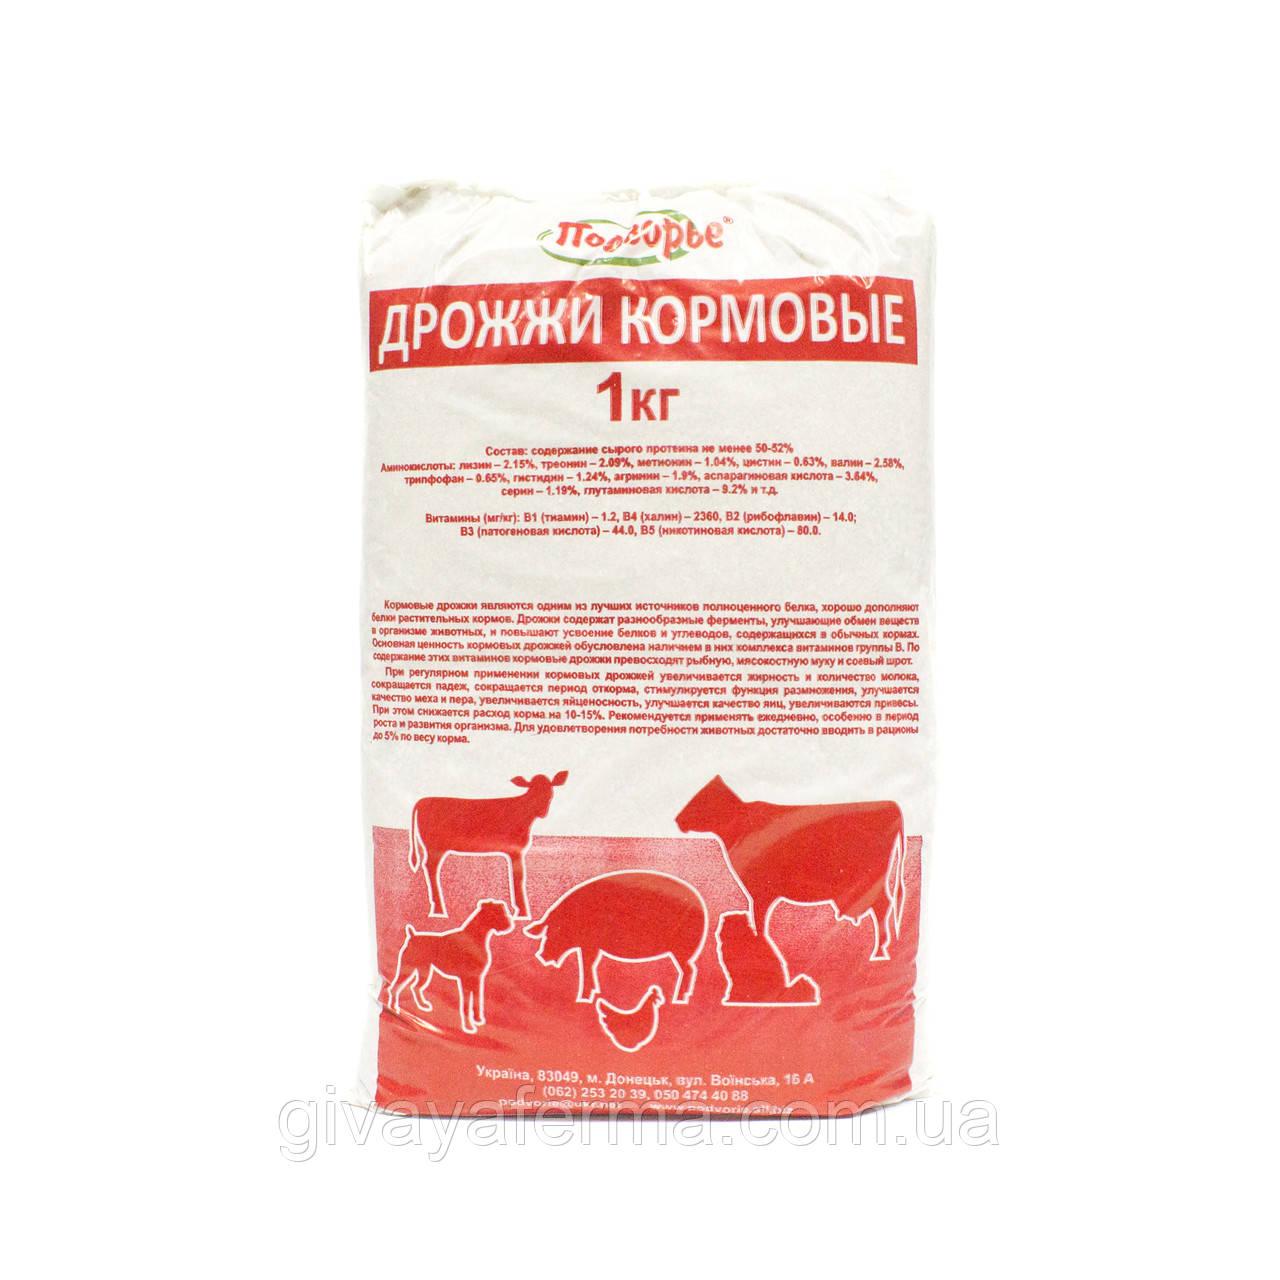 Дрожжи кормовые Протеин 39%, 1 кг, витаминная добавка